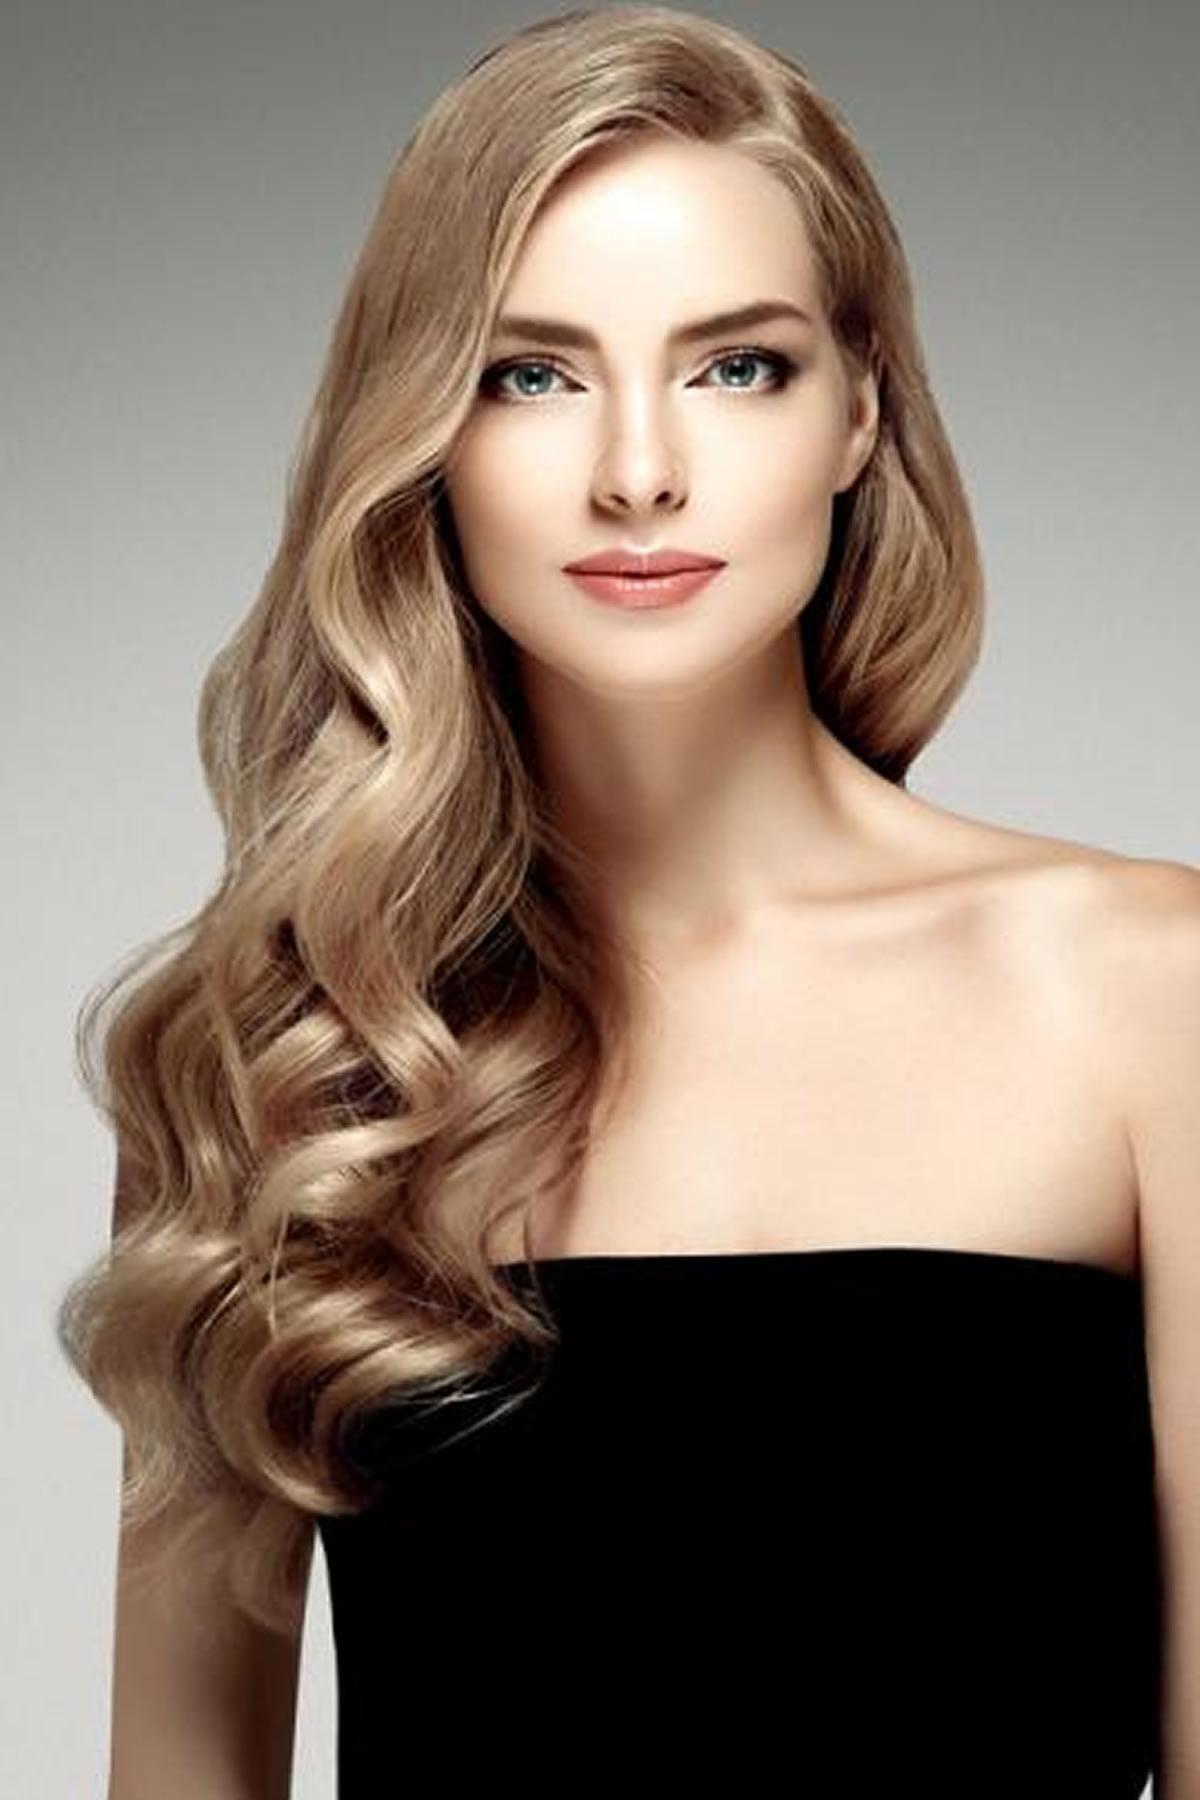 2018 Balayage Hairstyles for Long Hair  Balayage Hair Ideas  Page 7  HAIRSTYLES